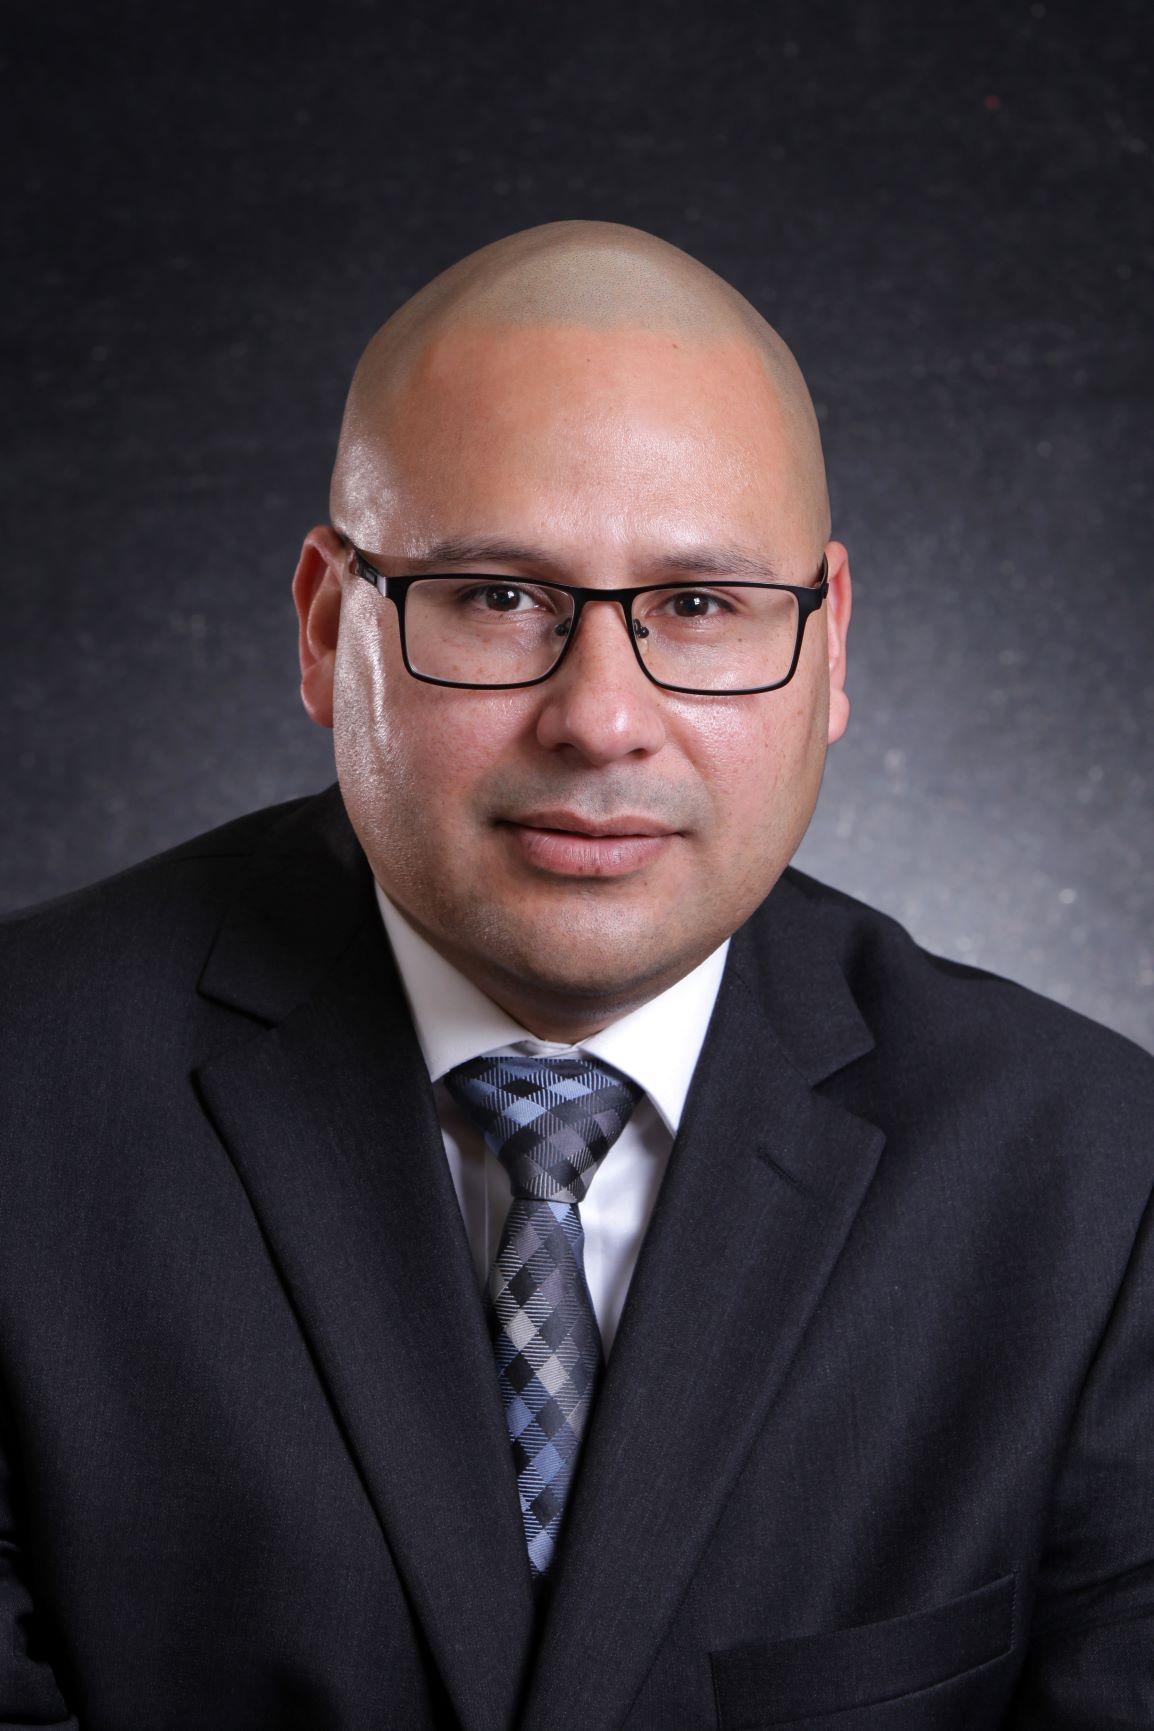 ROBERTO HERNANDEZ Financial Professional & Insurance Agent